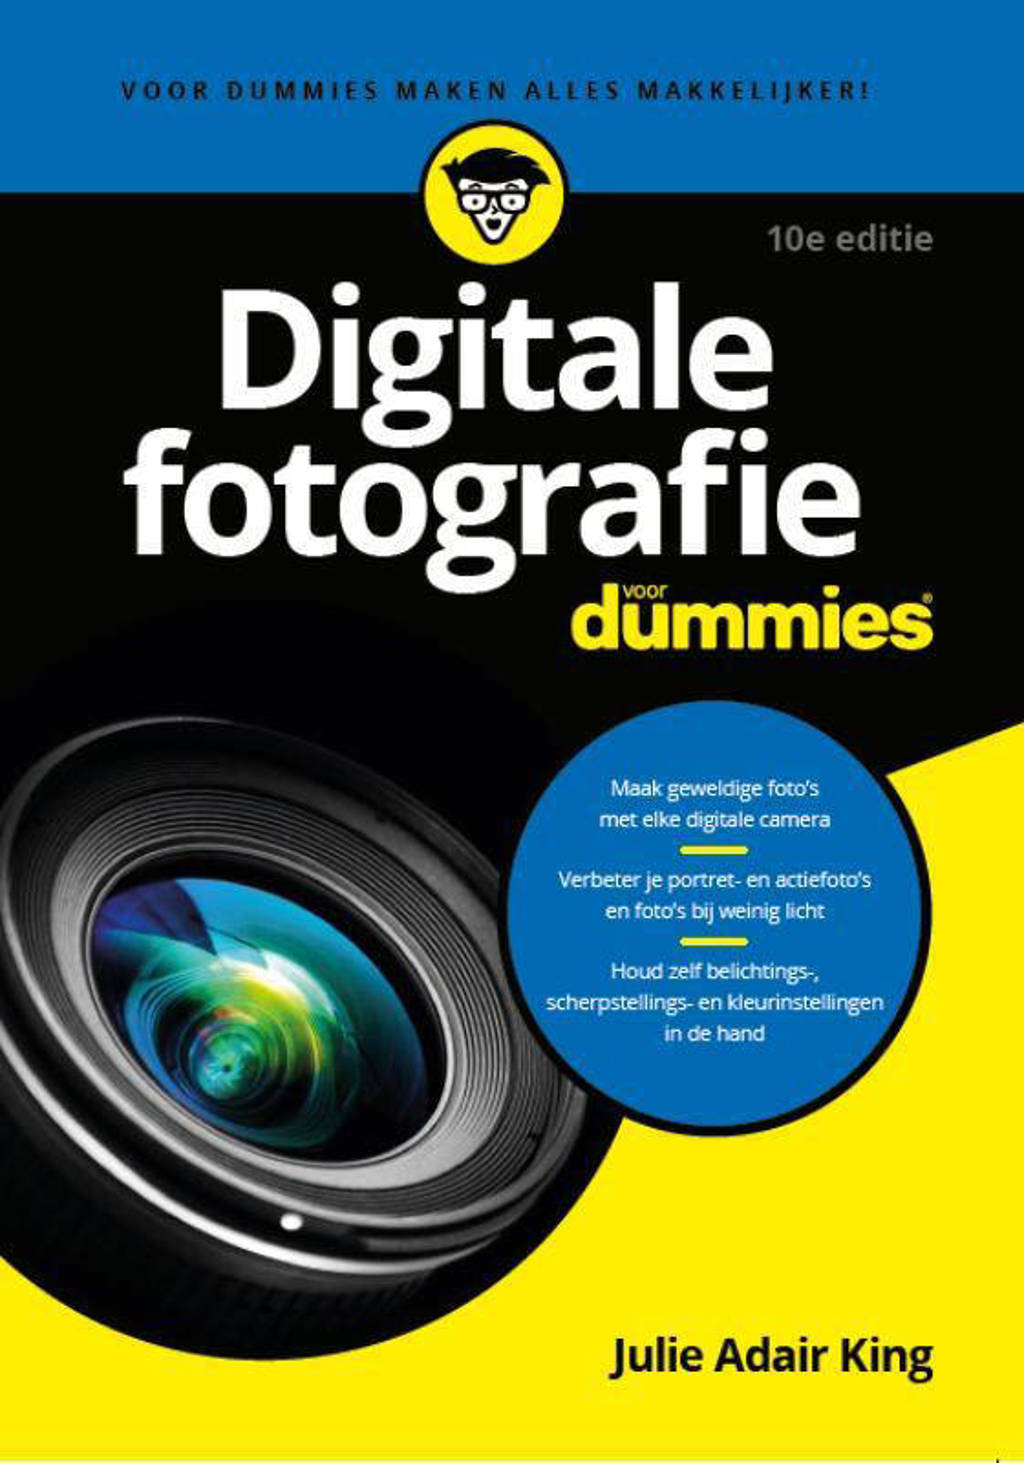 Digitale fotografie voor Dummies, 10e editie - Julie Adair King